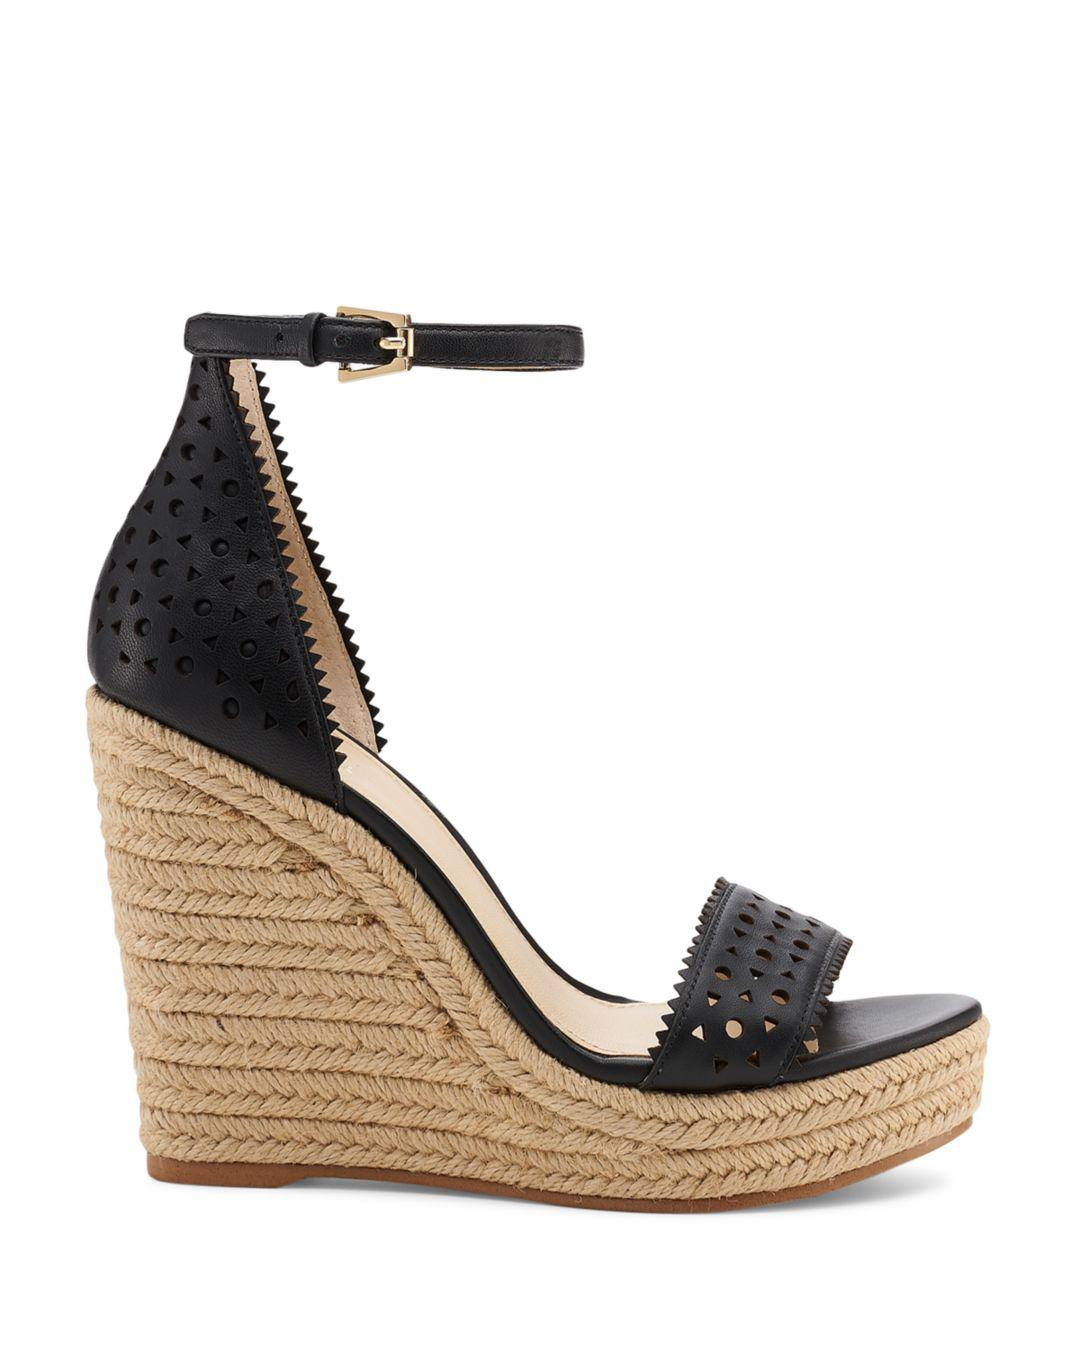 e47908d8e37 Lyst - Botkier Women s Jamie Leather Espadrille Wedge Sandals in Black